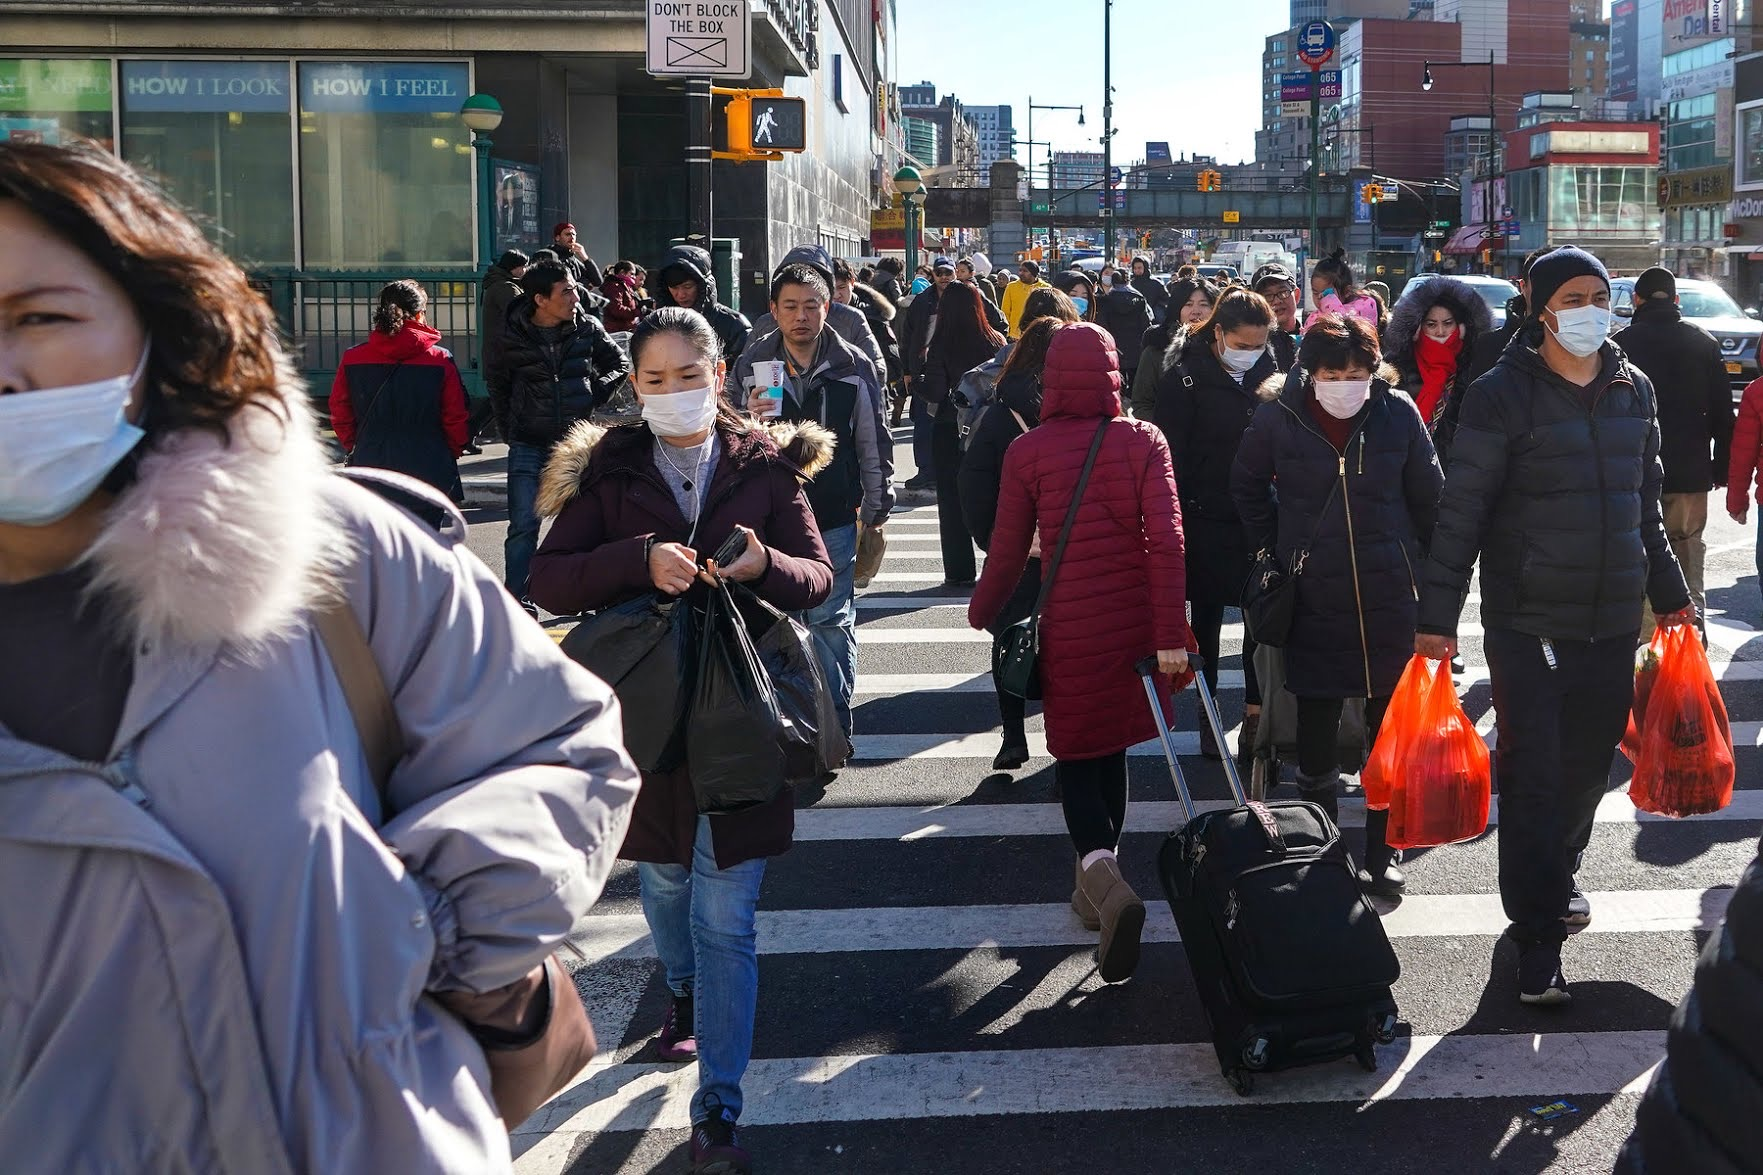 stranded-nigerians-to-pay-for-evacuation-new-york-coronavirus-tottenham-hotspur-reverses-furlough-decision-latest-news-global-world-stories-monday-april-2020-style-rave